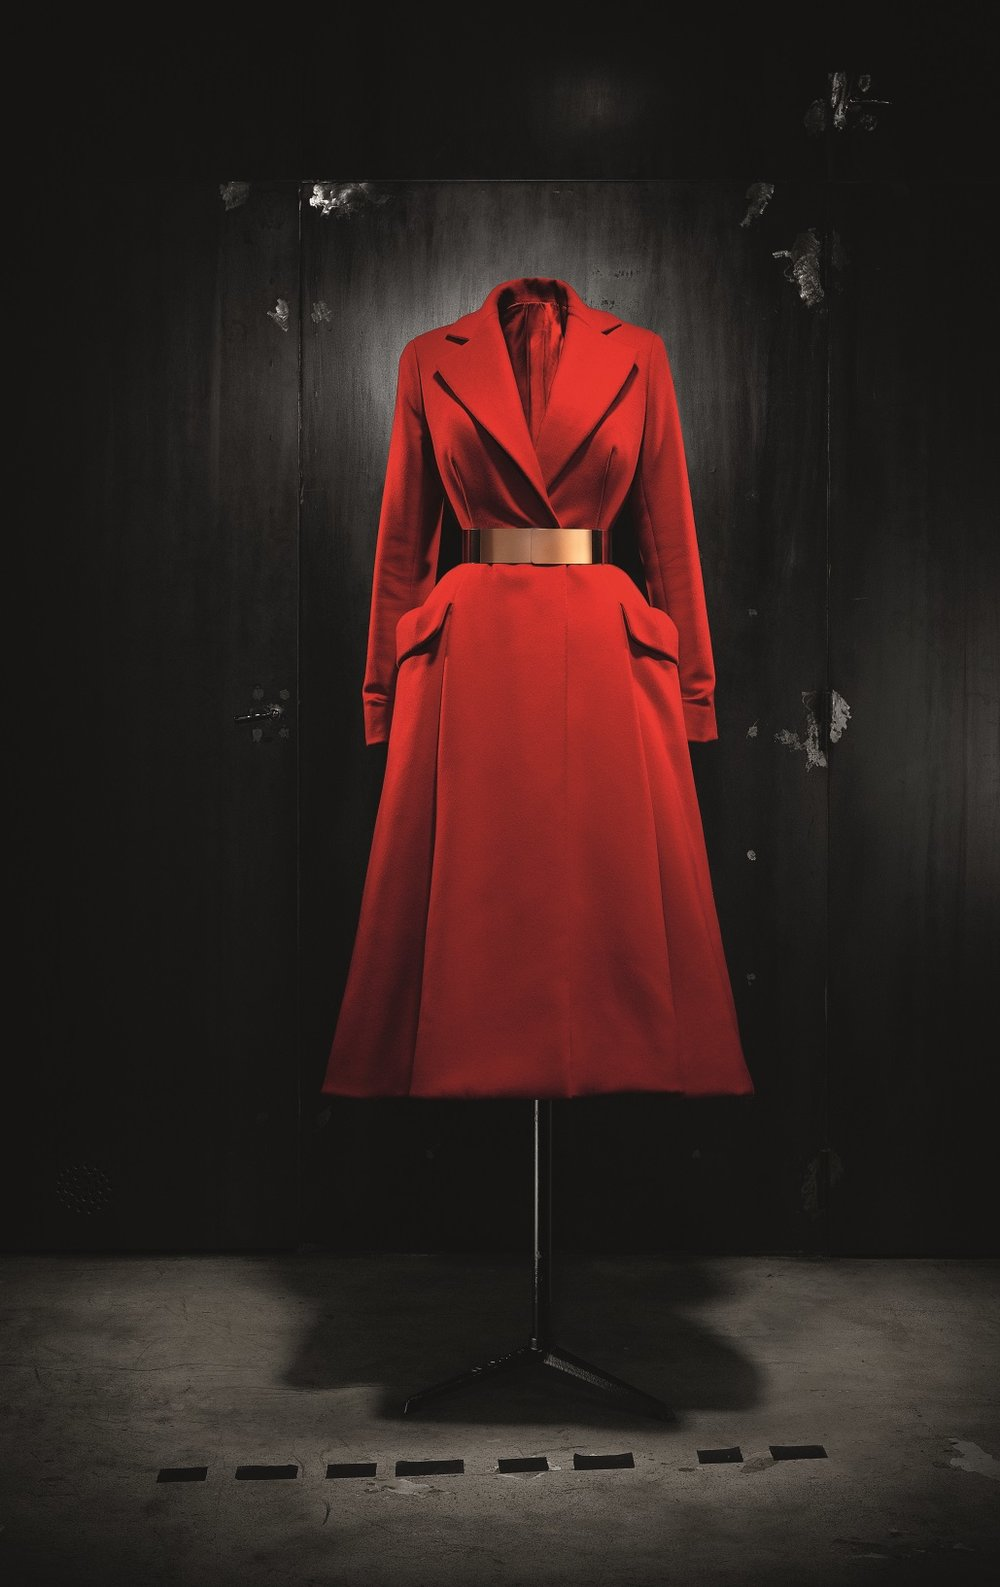 Christian Dior by Raf Simons (b.1968), Coat, Haute Couture, AutumnWinter 2012. Photo (c) Laziz Hamani. Dior Héritage collection, Paris.jpg